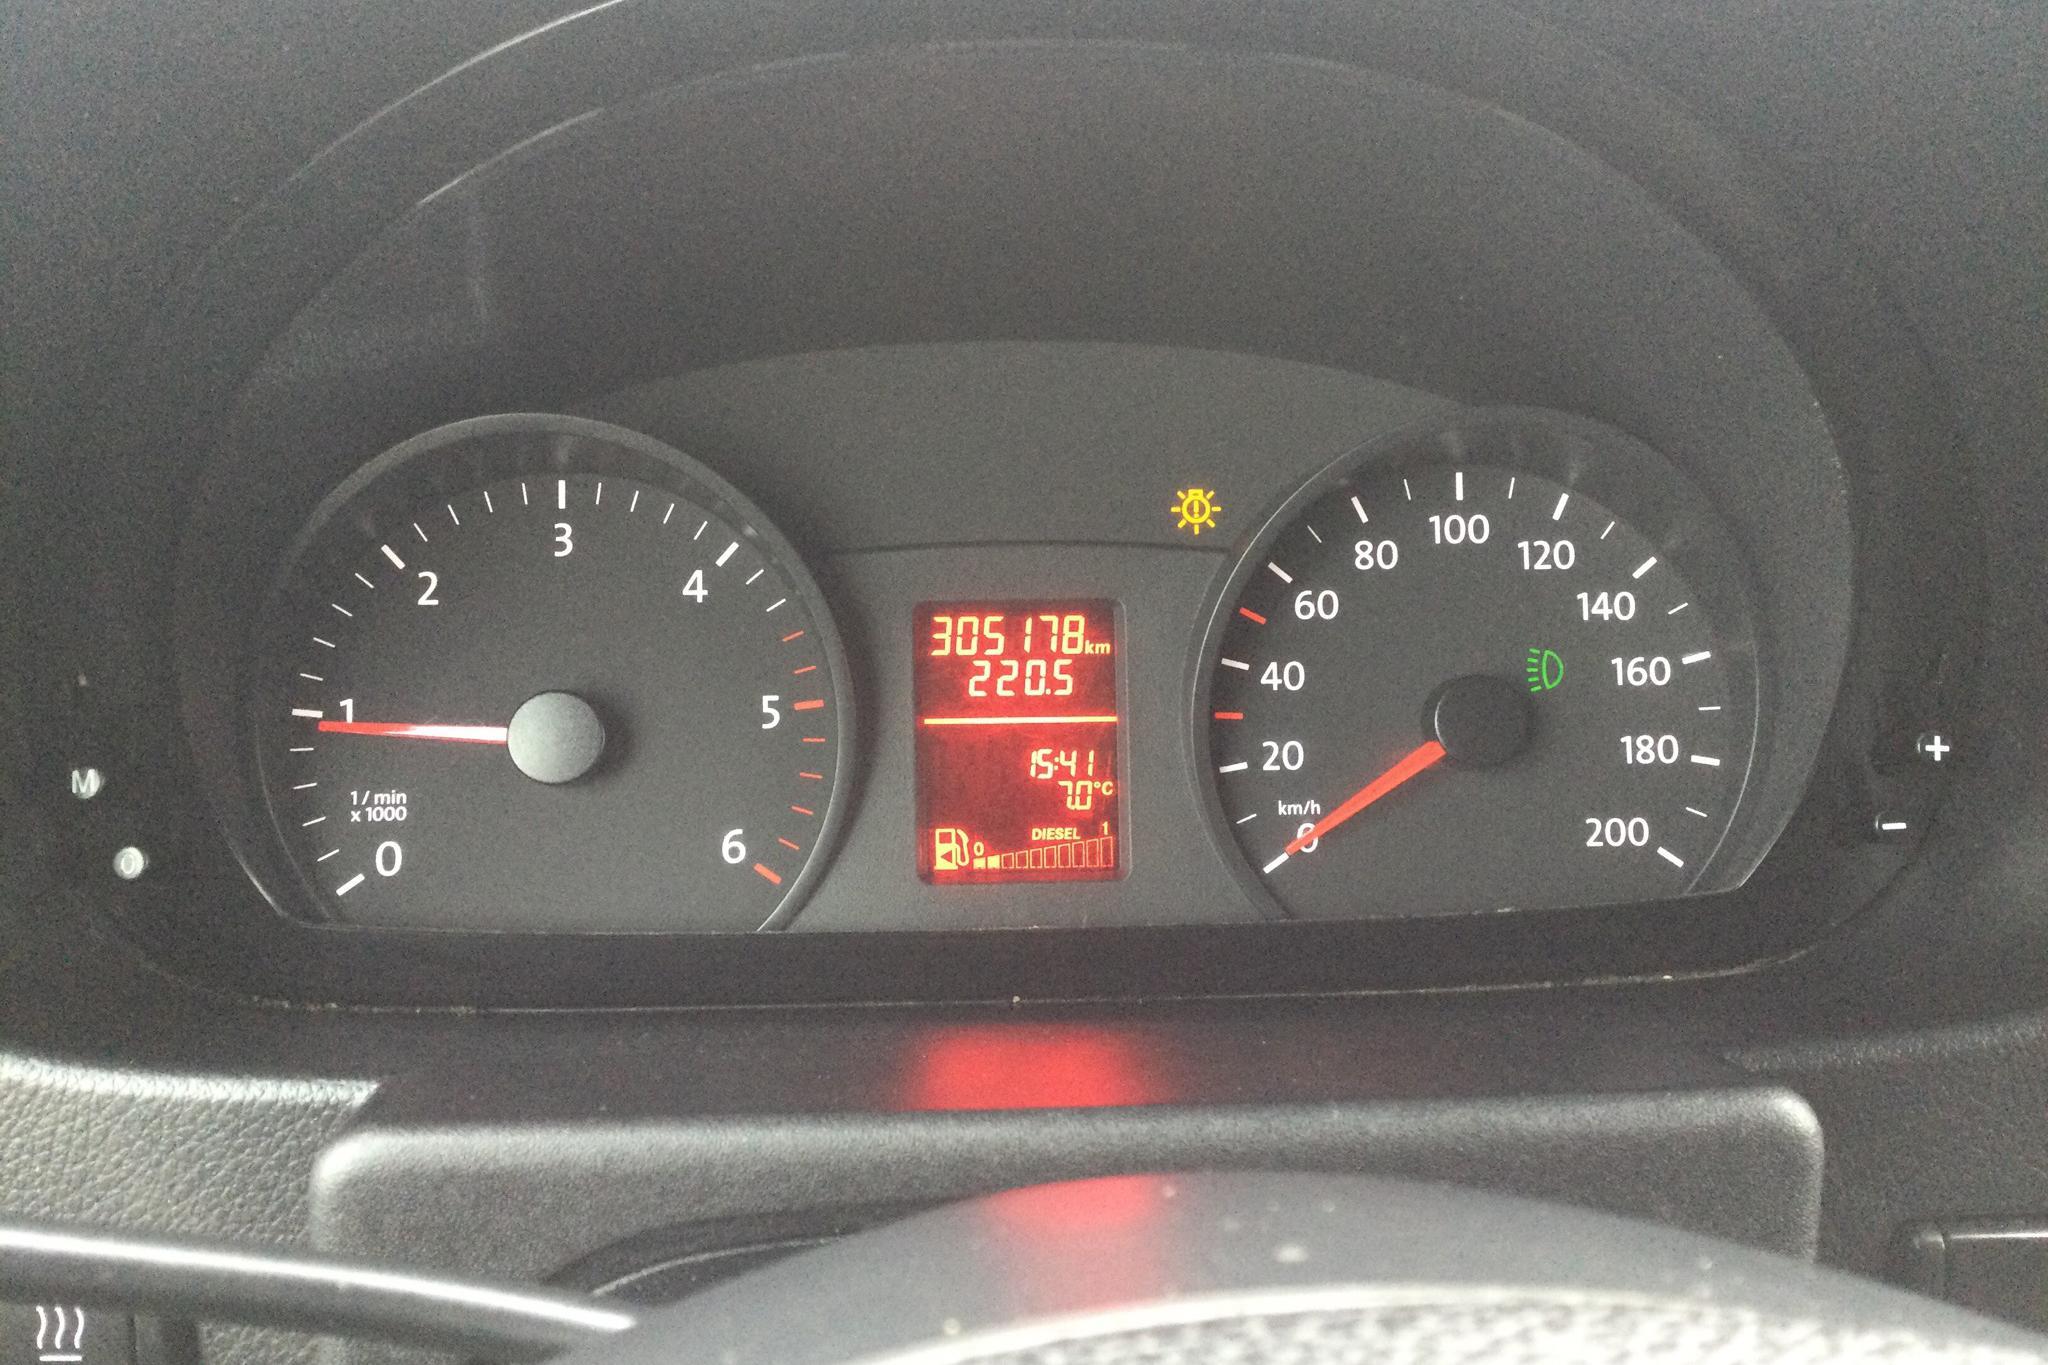 VW Crafter 35 2.0 TDI Volymskåp (163hk) - 305 170 km - Manual - white - 2014